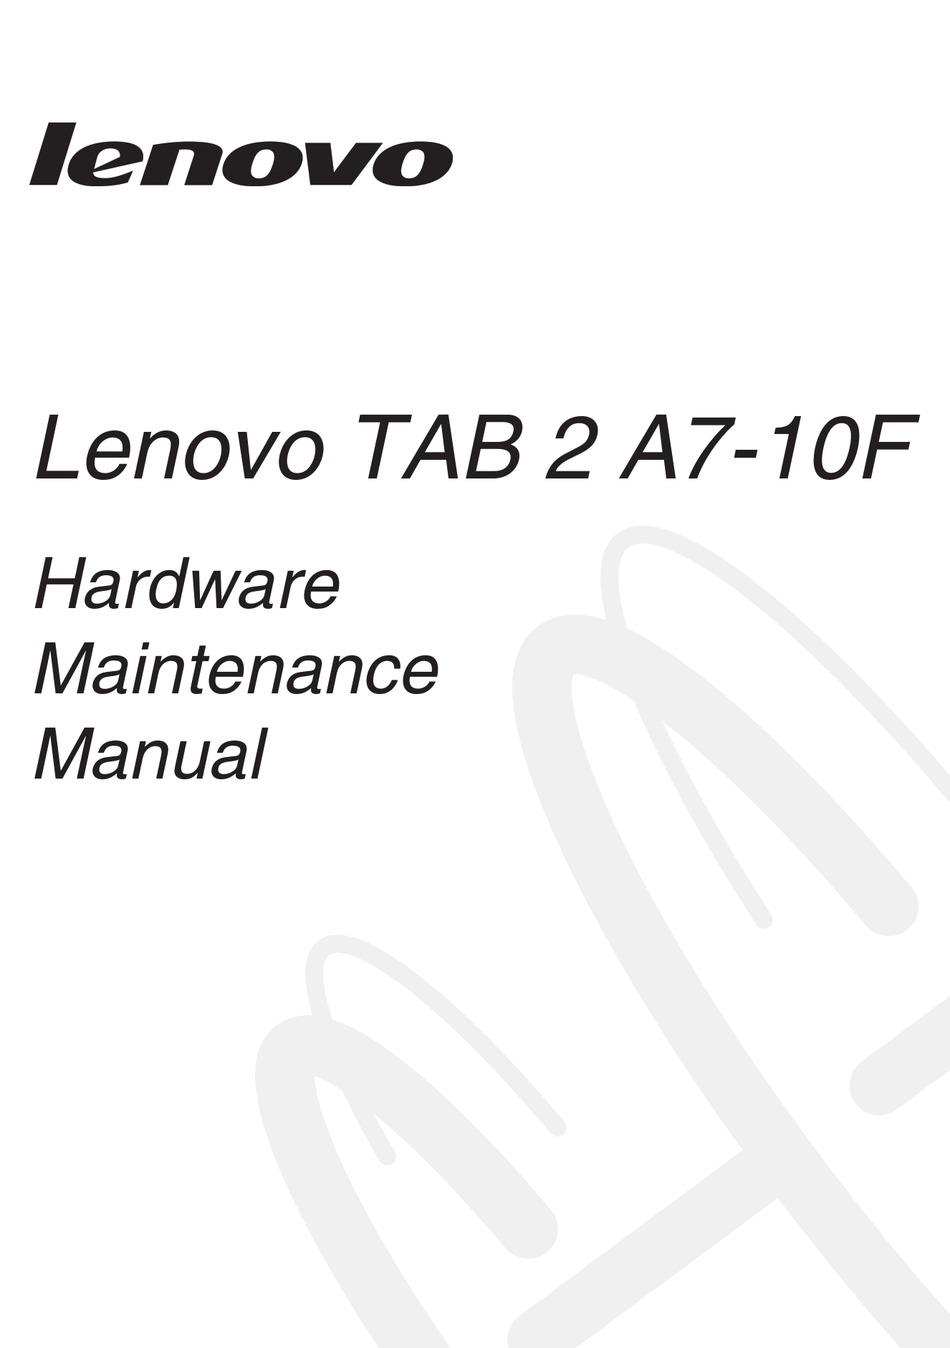 LENOVO TAB 2 A7-10F HARDWARE MAINTENANCE MANUAL Pdf